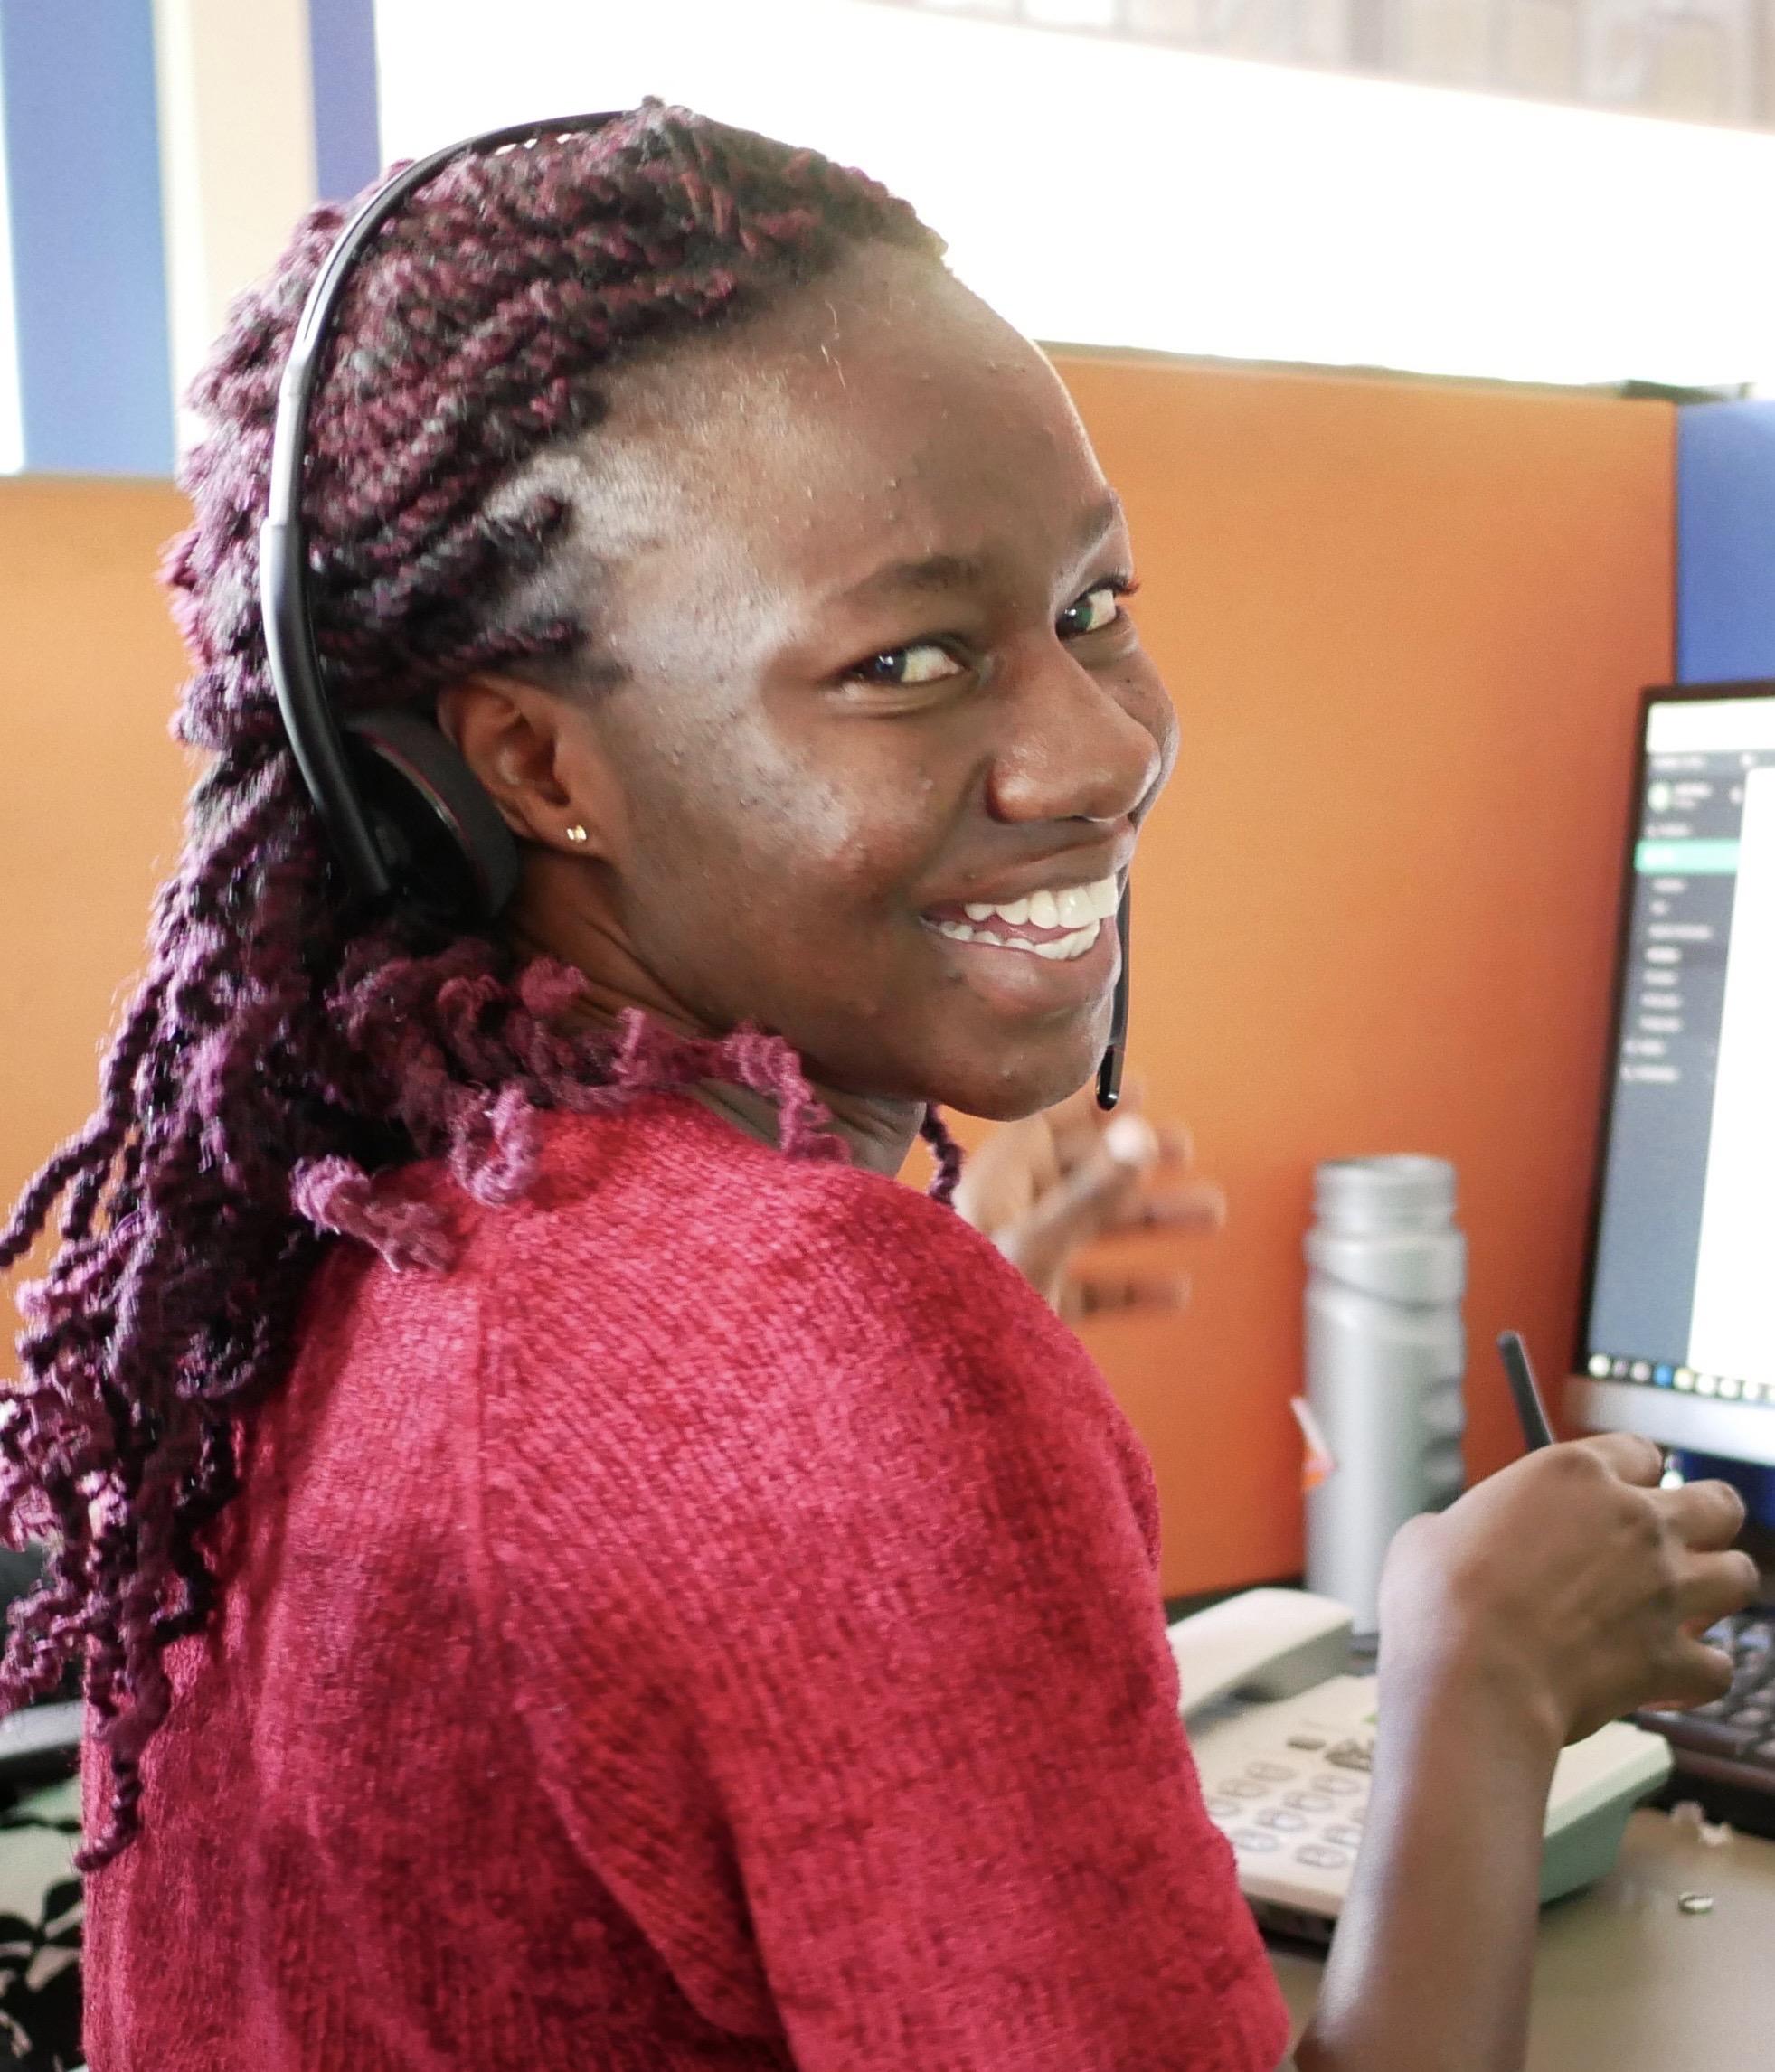 Staff Upper 23 female CSR